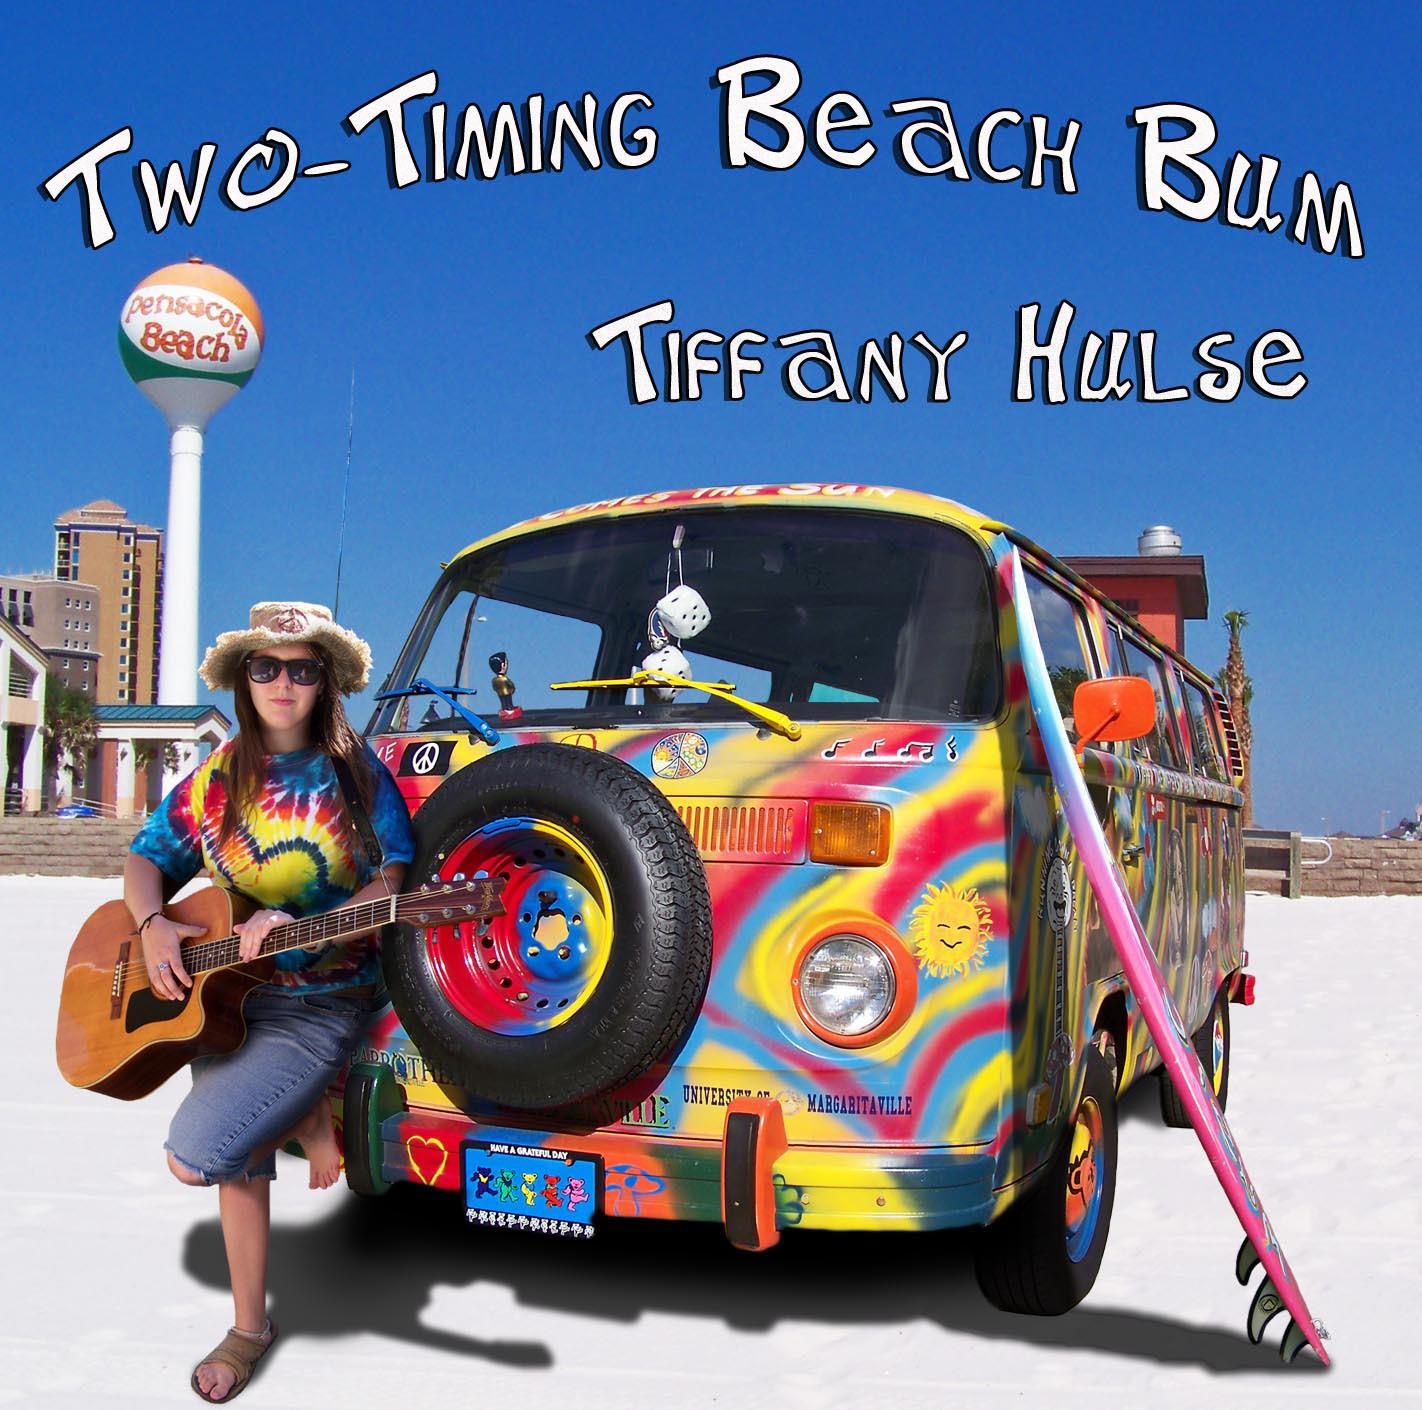 Two-Timing Beach Bum